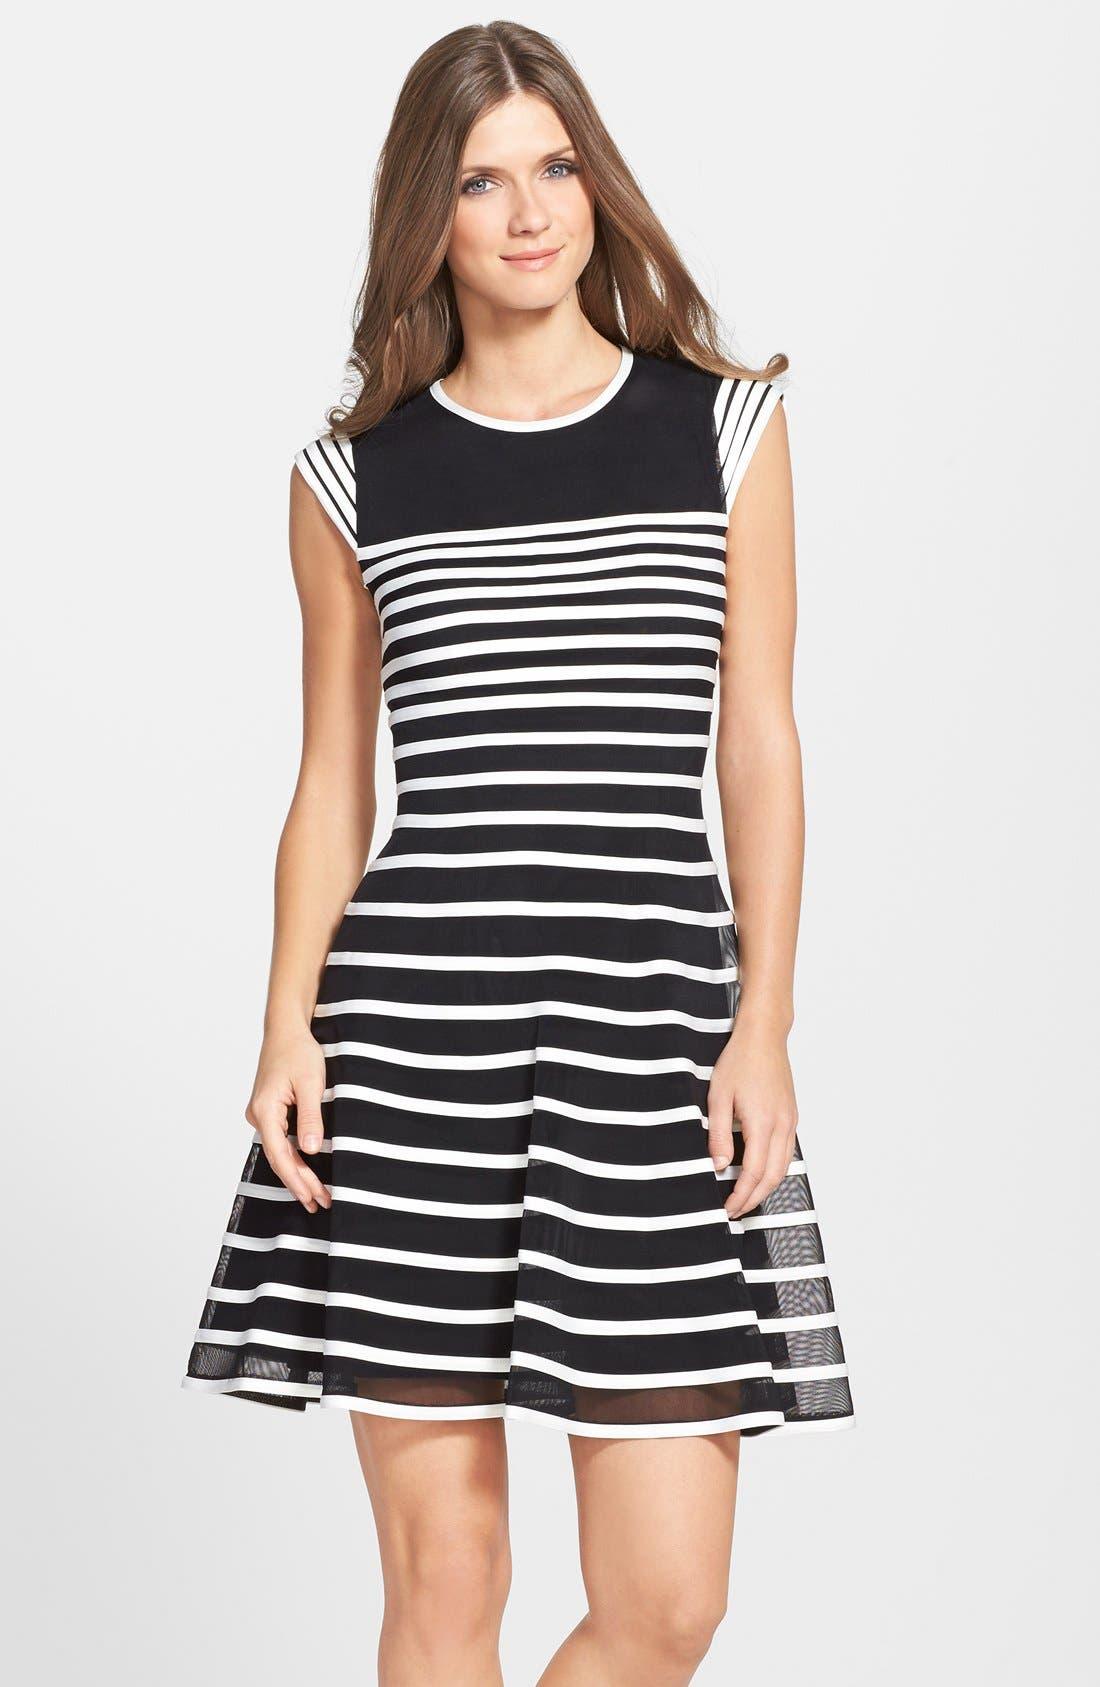 Alternate Image 1 Selected - Betsy & Adam Stripe Mesh Fit & Flare Dress